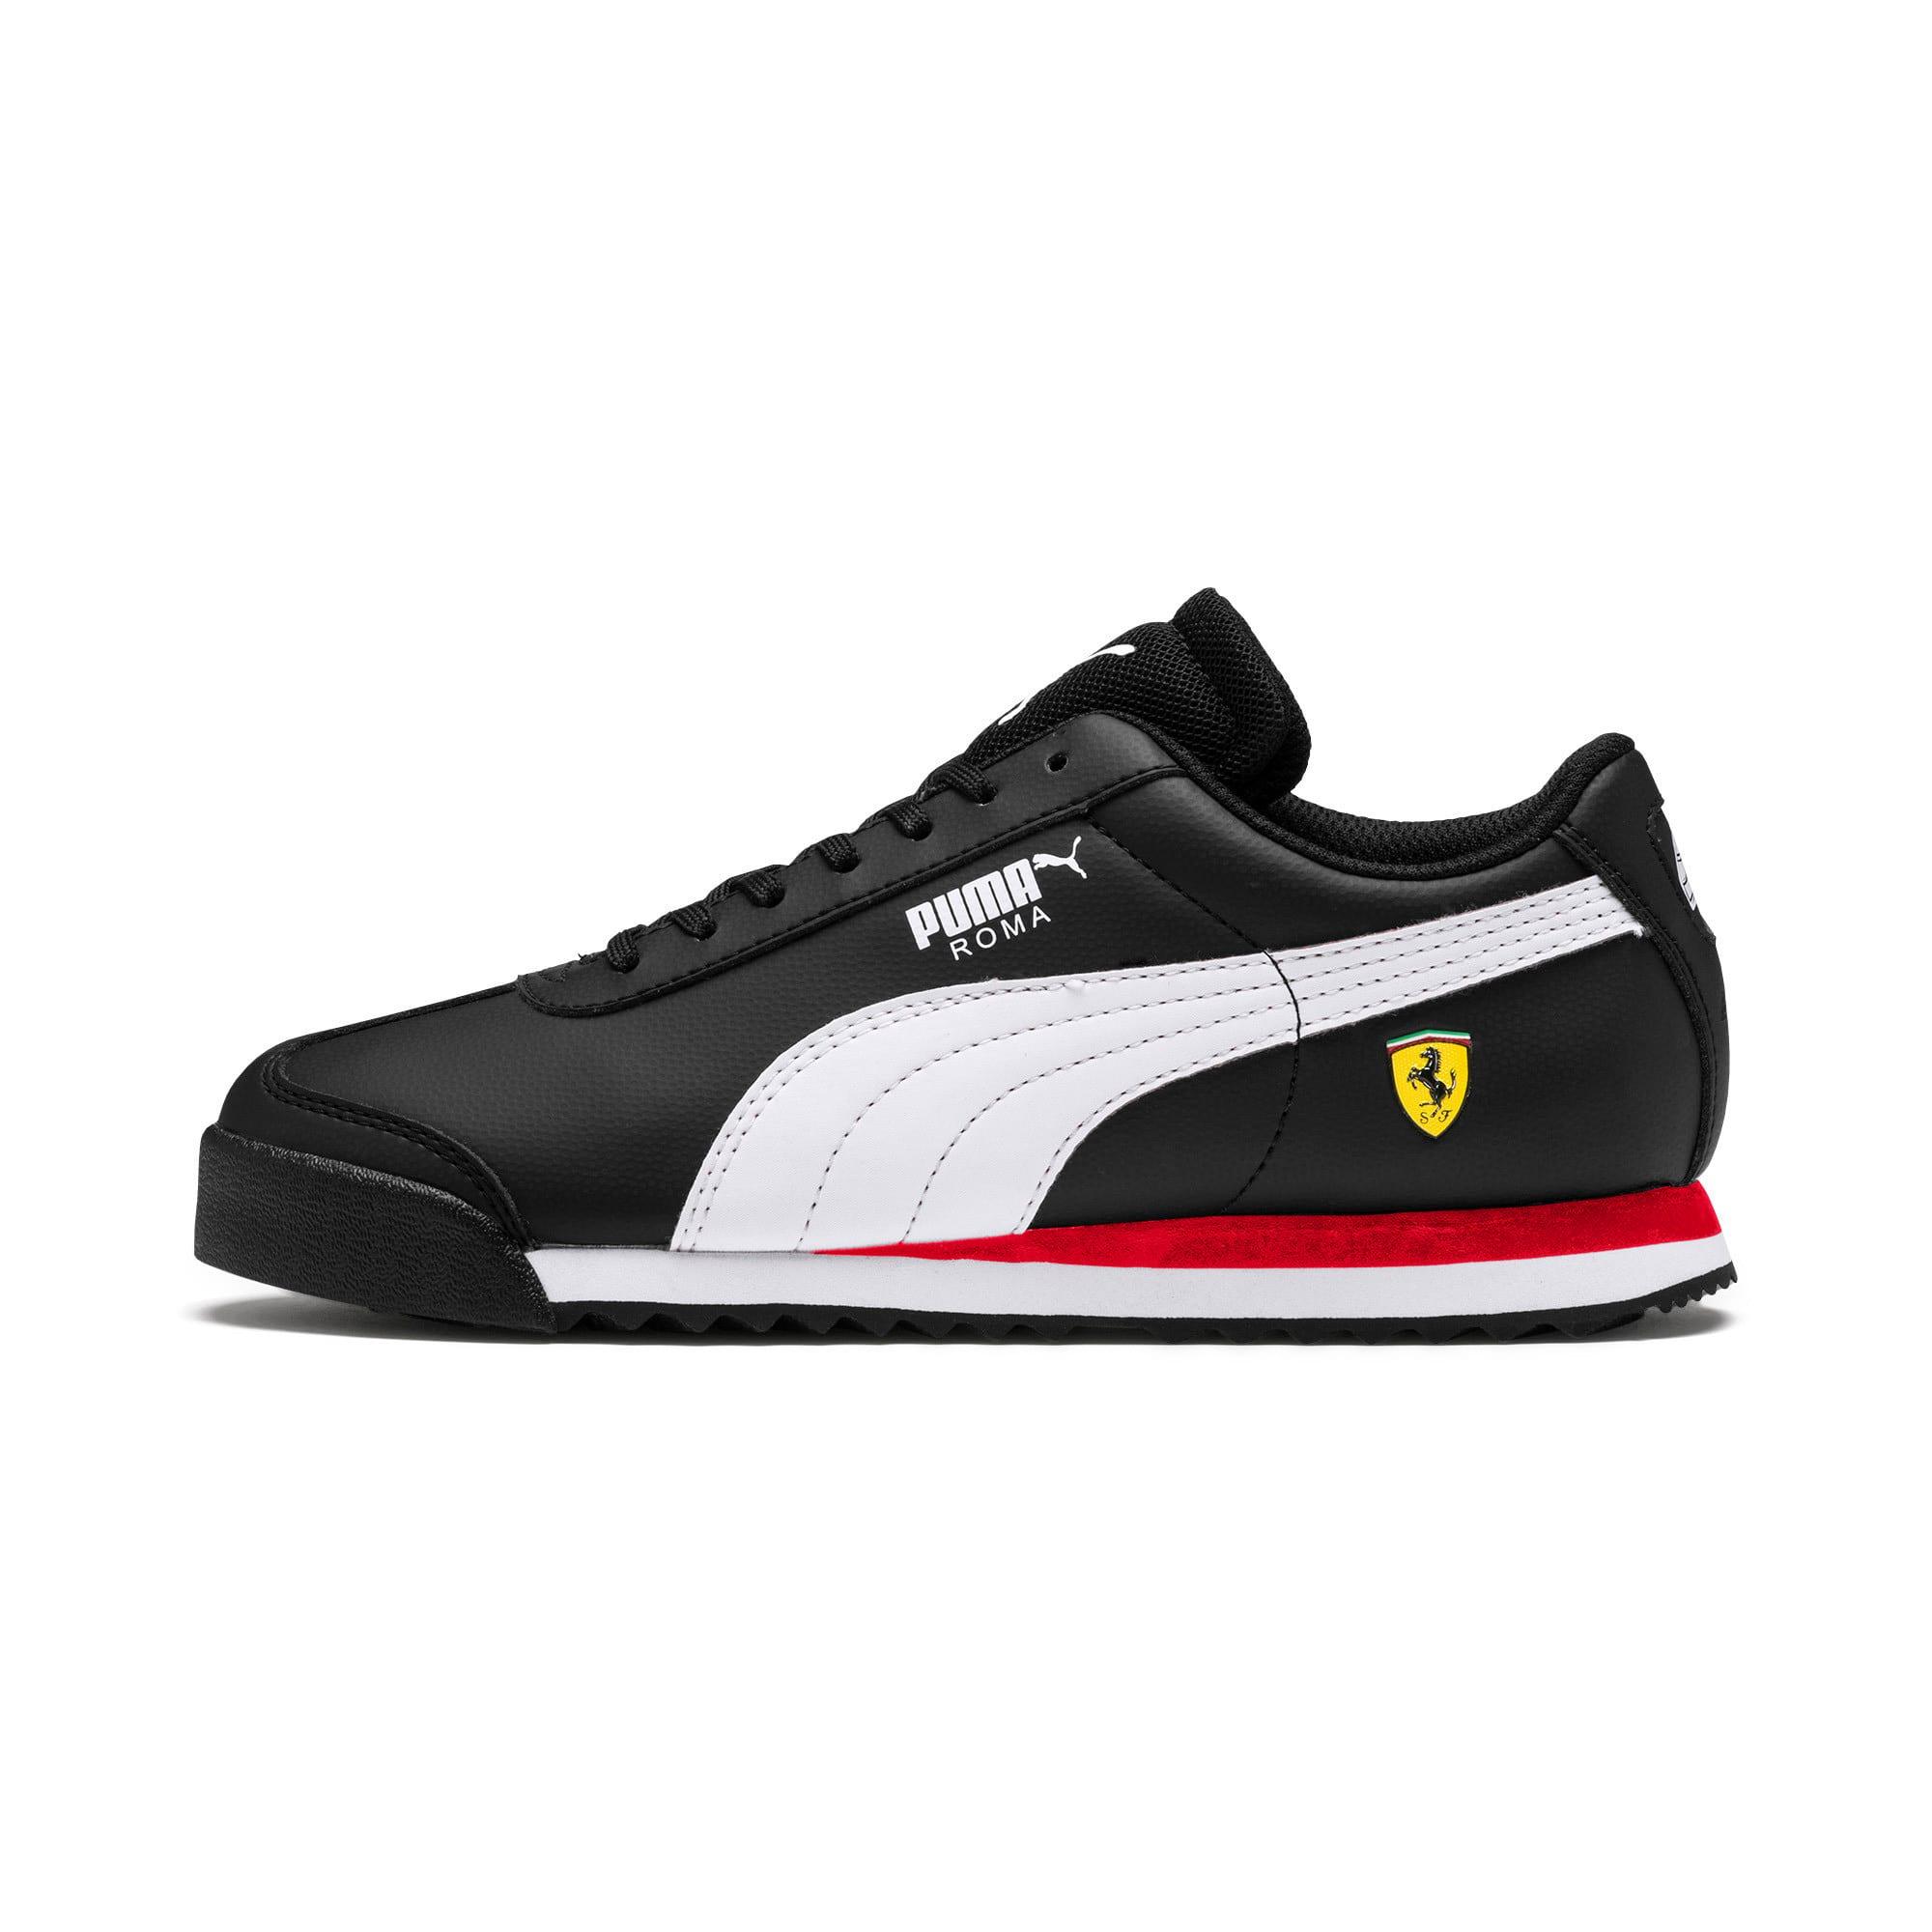 Thumbnail 1 of Scuderia Ferrari Roma Sneakers JR, Black-White-Rosso Corsa, medium